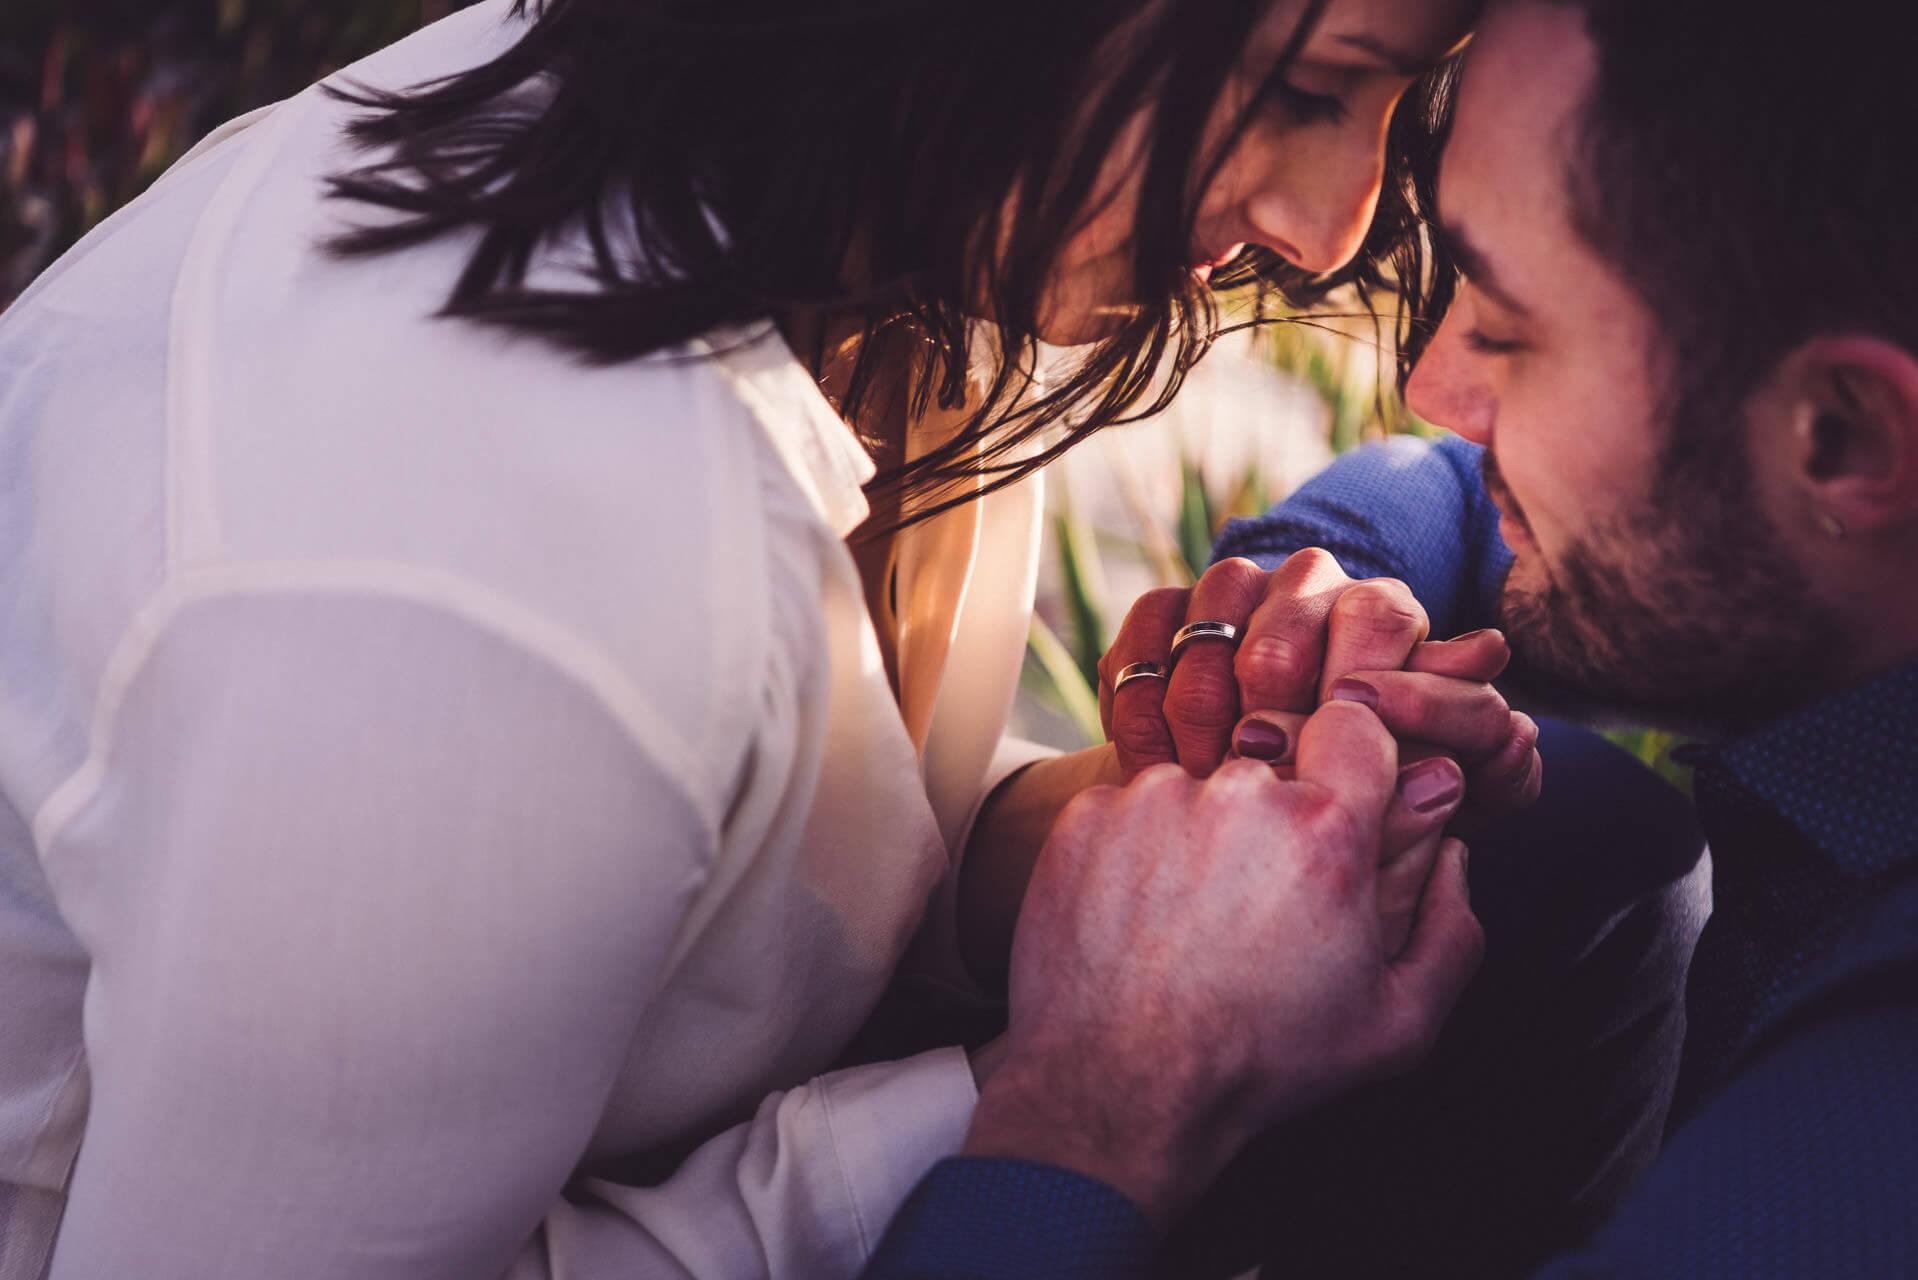 photographe mariage seance d'engagment studiograou pezenas